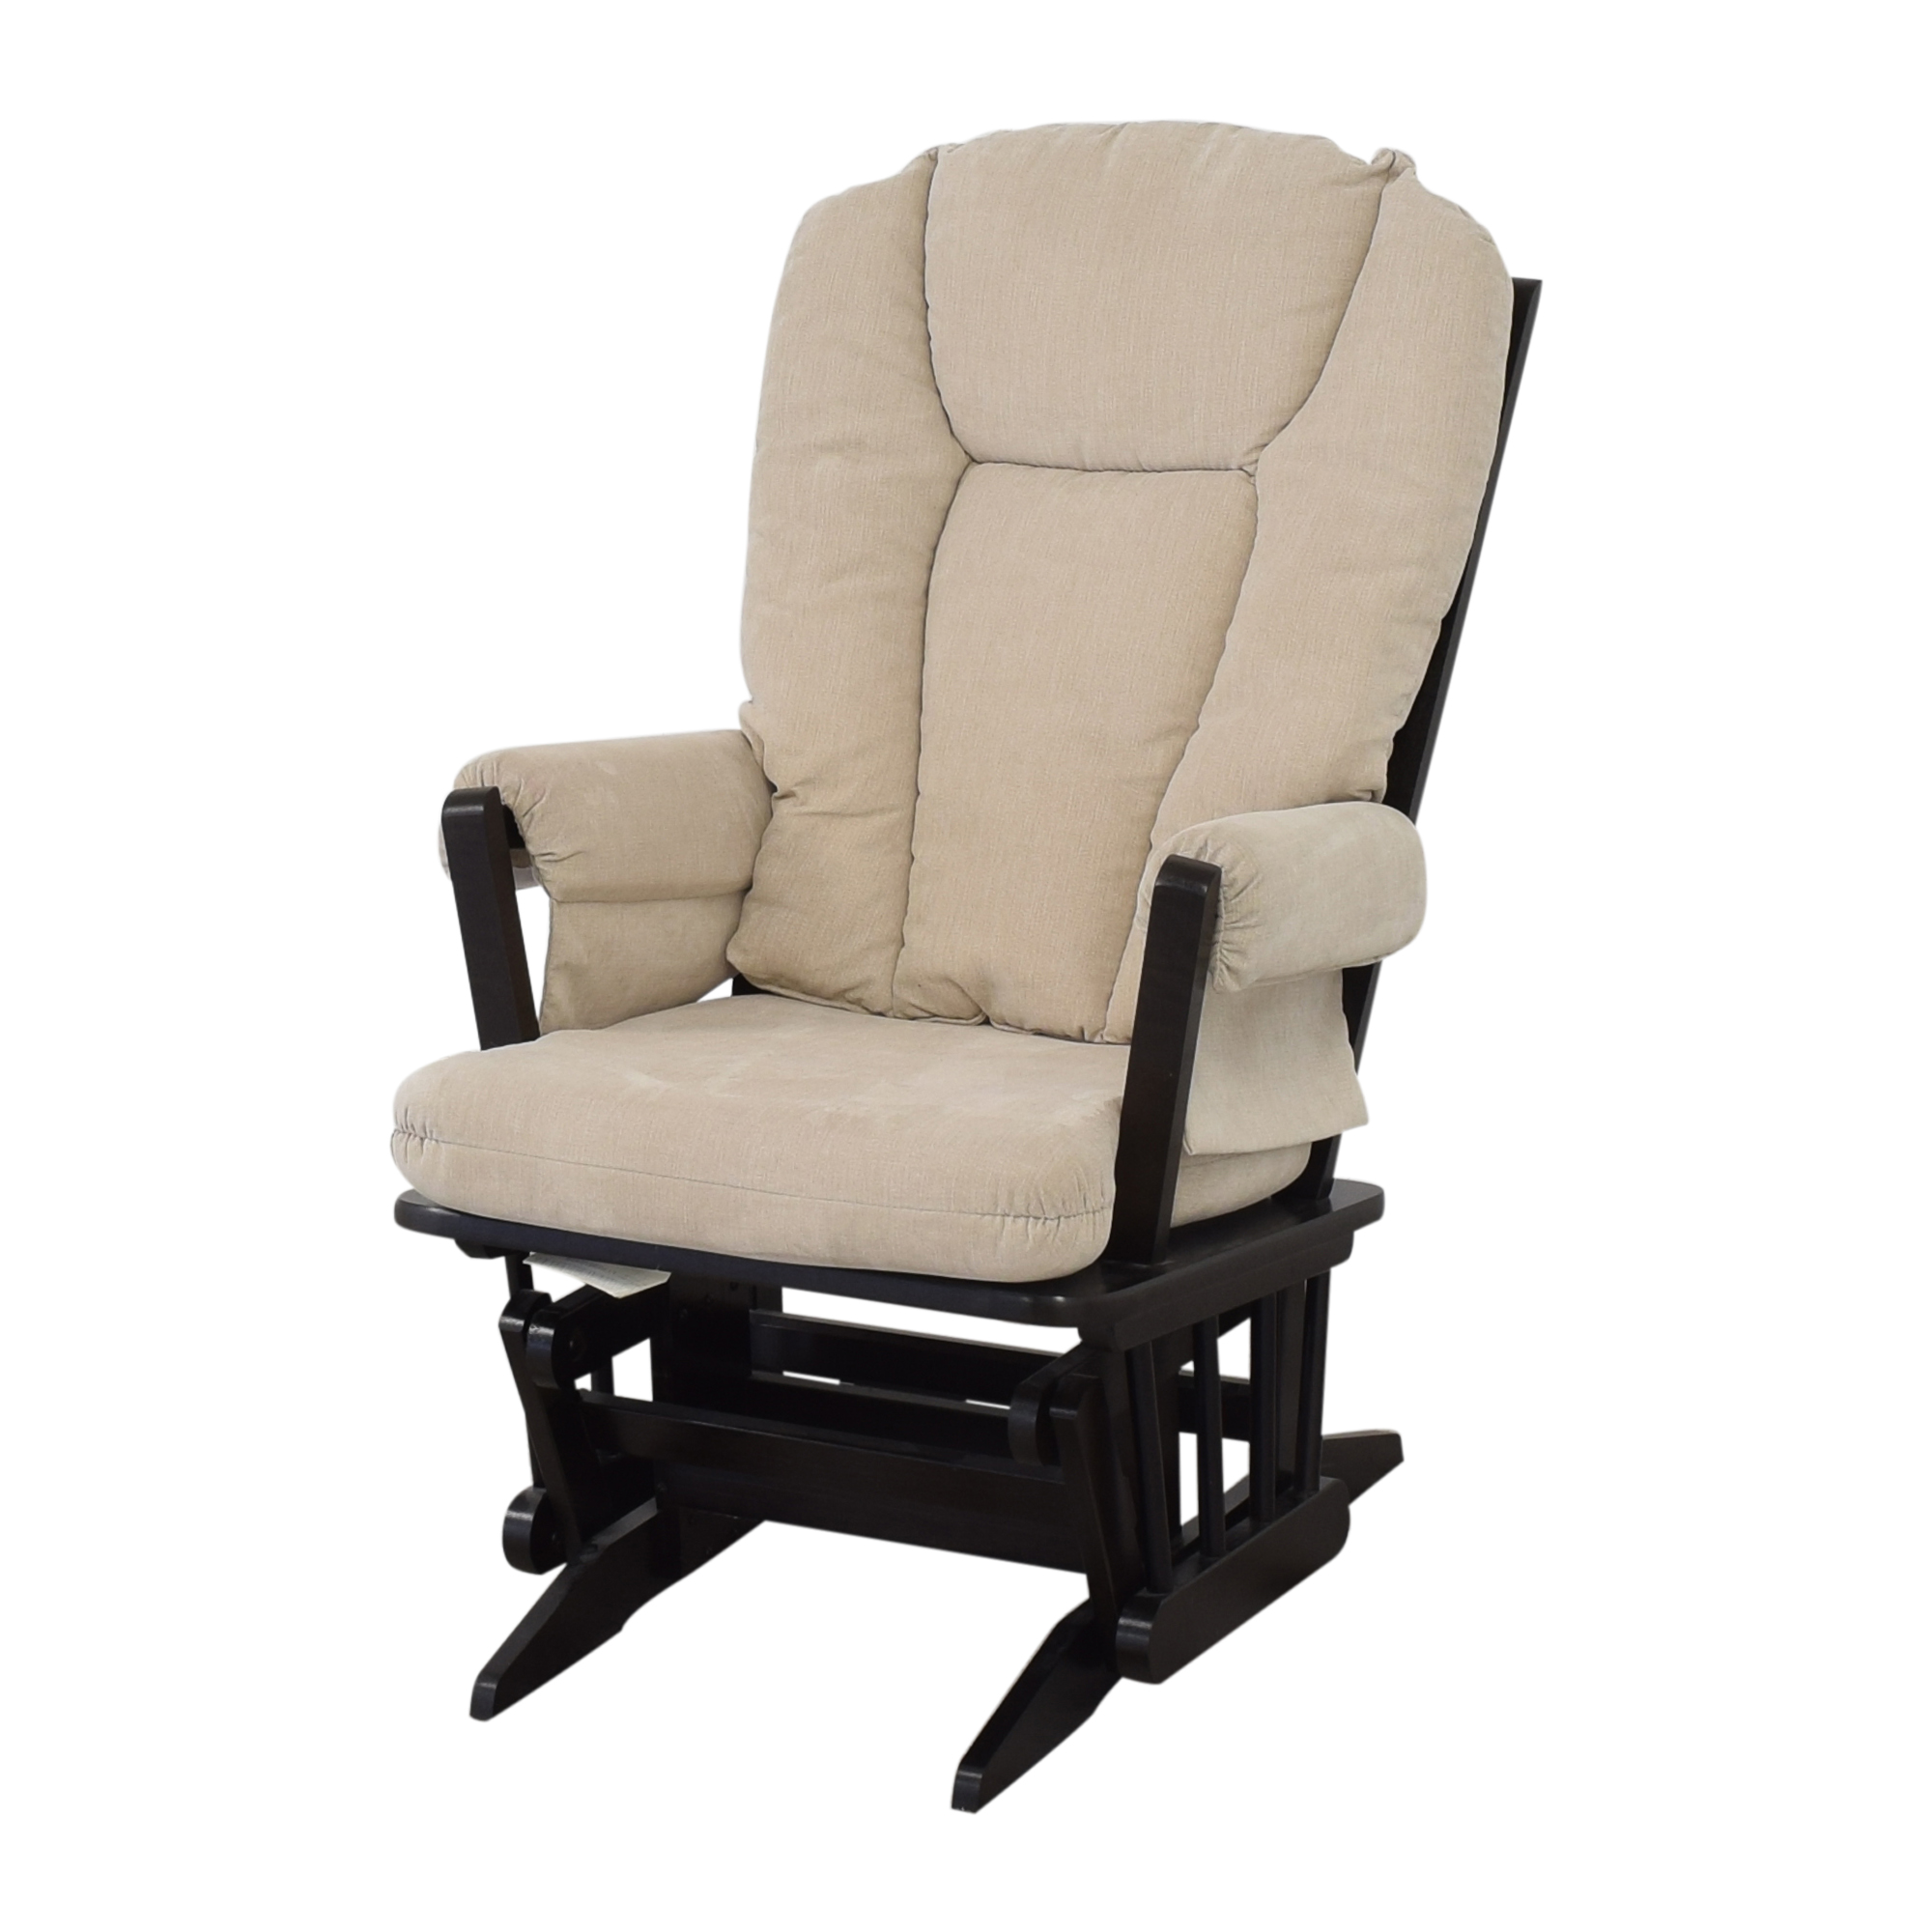 shop Dutailier Dutalier Rocking Chair and Ottoman online